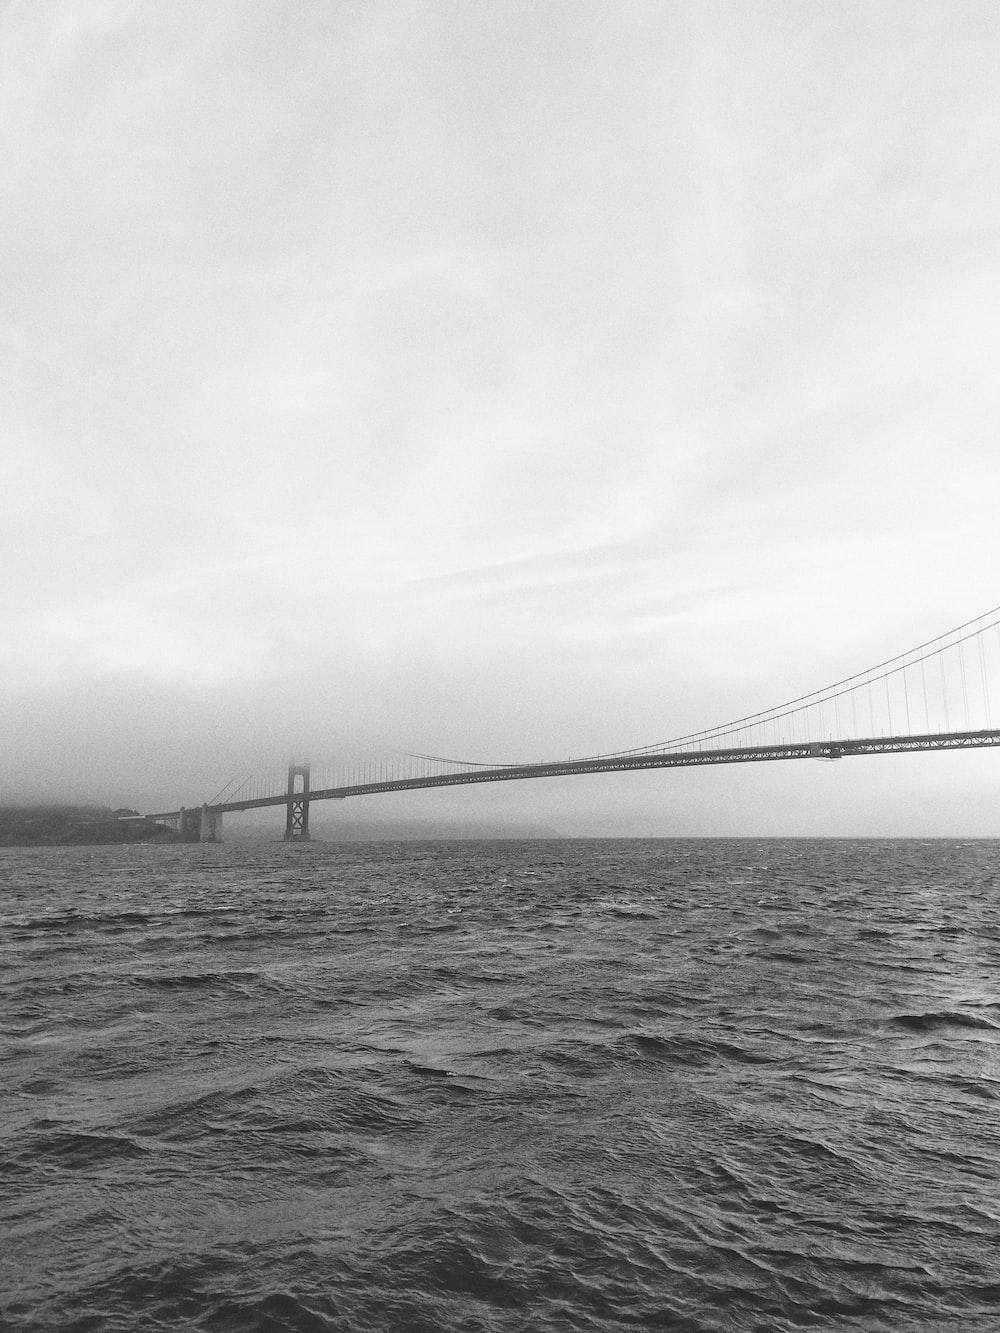 grayscale photo of bridge near body of water